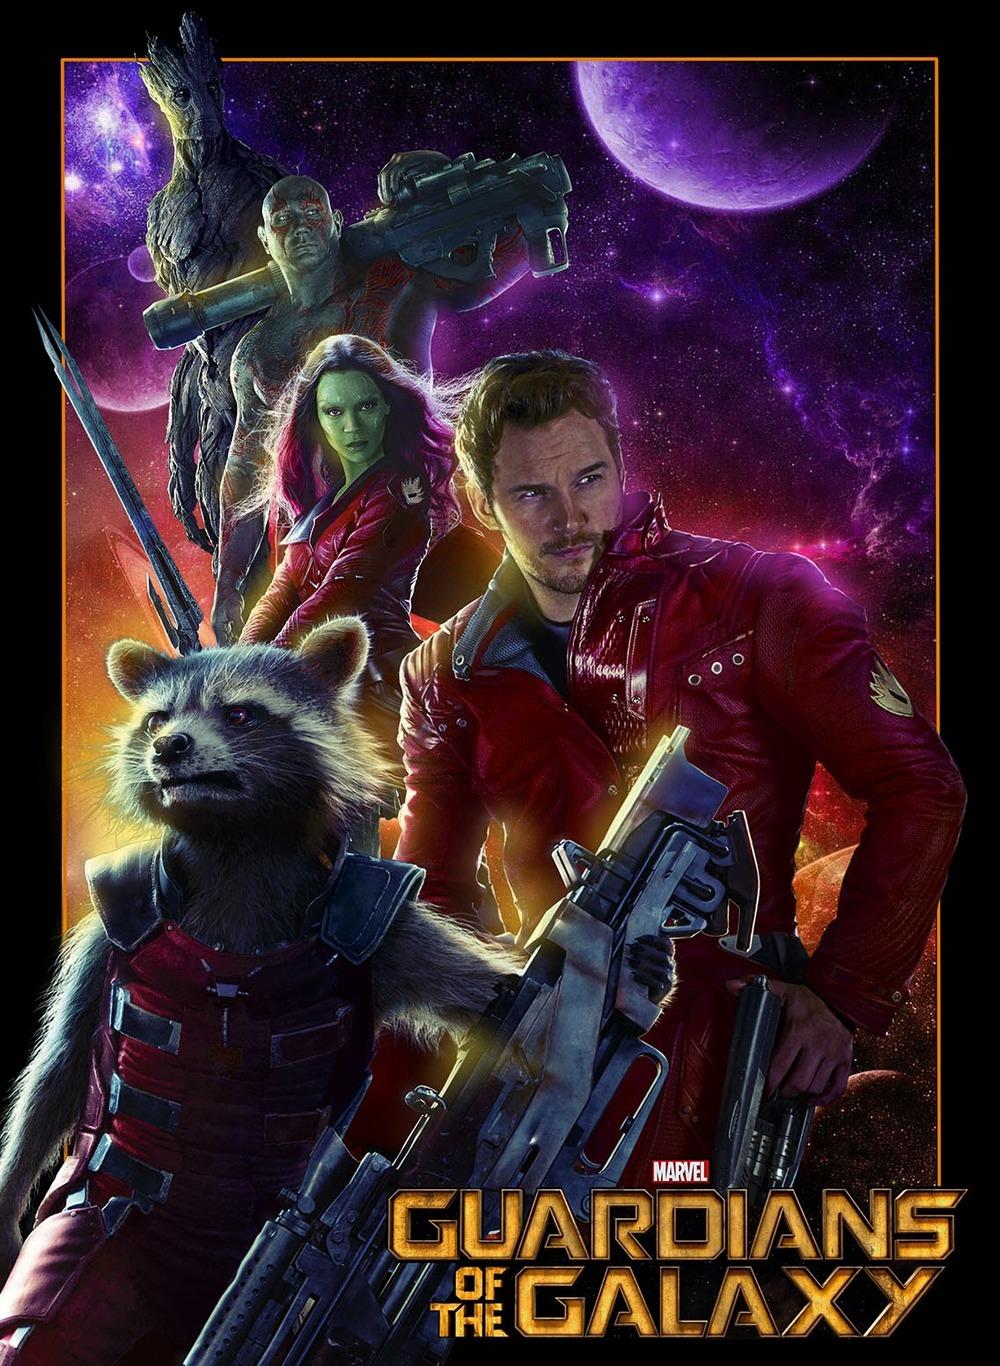 Guardians_poster.jpg